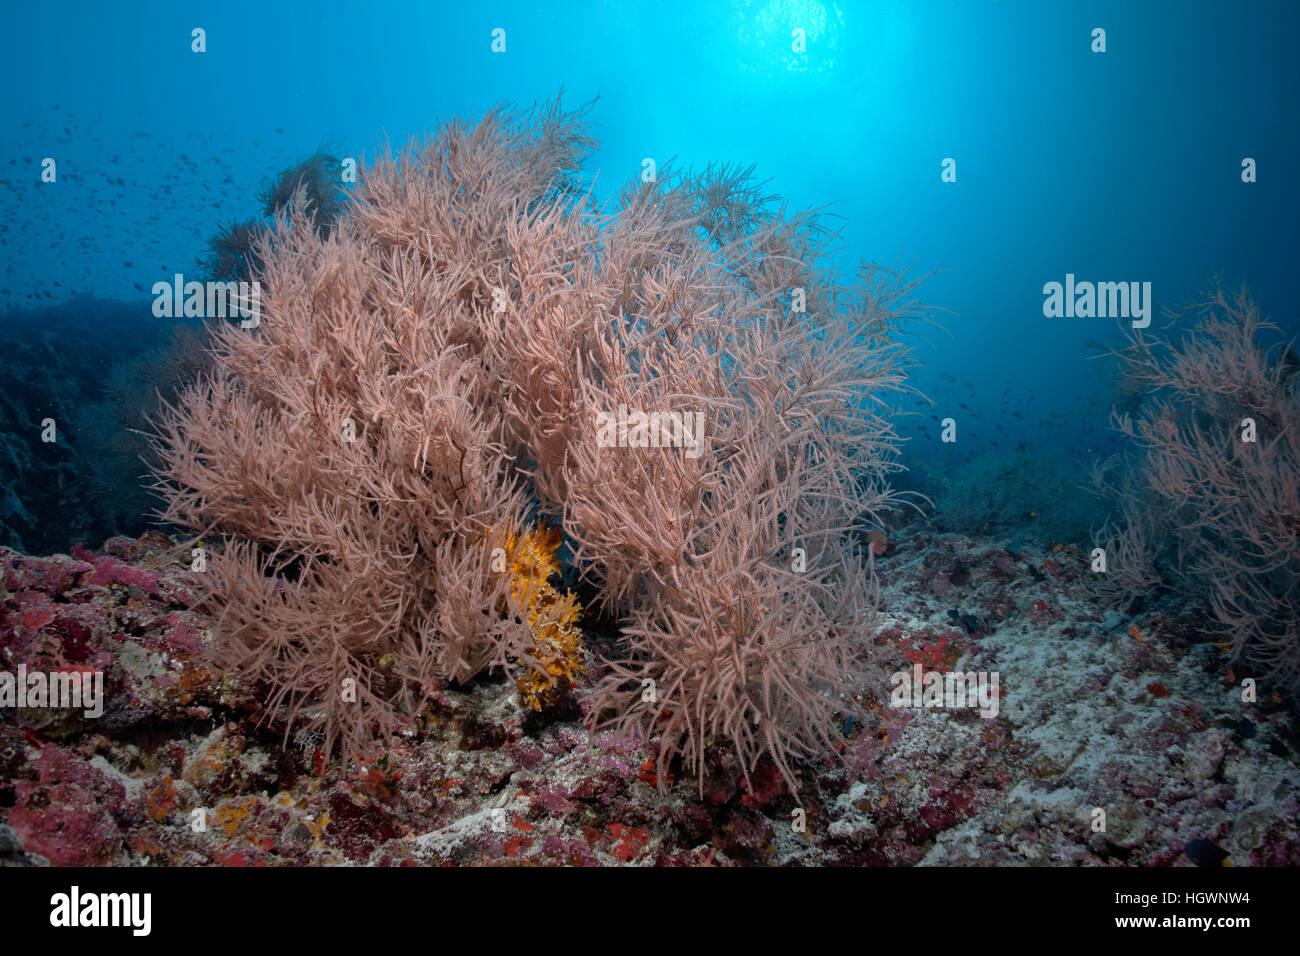 Korallenriff mit schwarze Koralle (Antipathes sp.) Lhaviyani Atoll, Malediven Stockbild